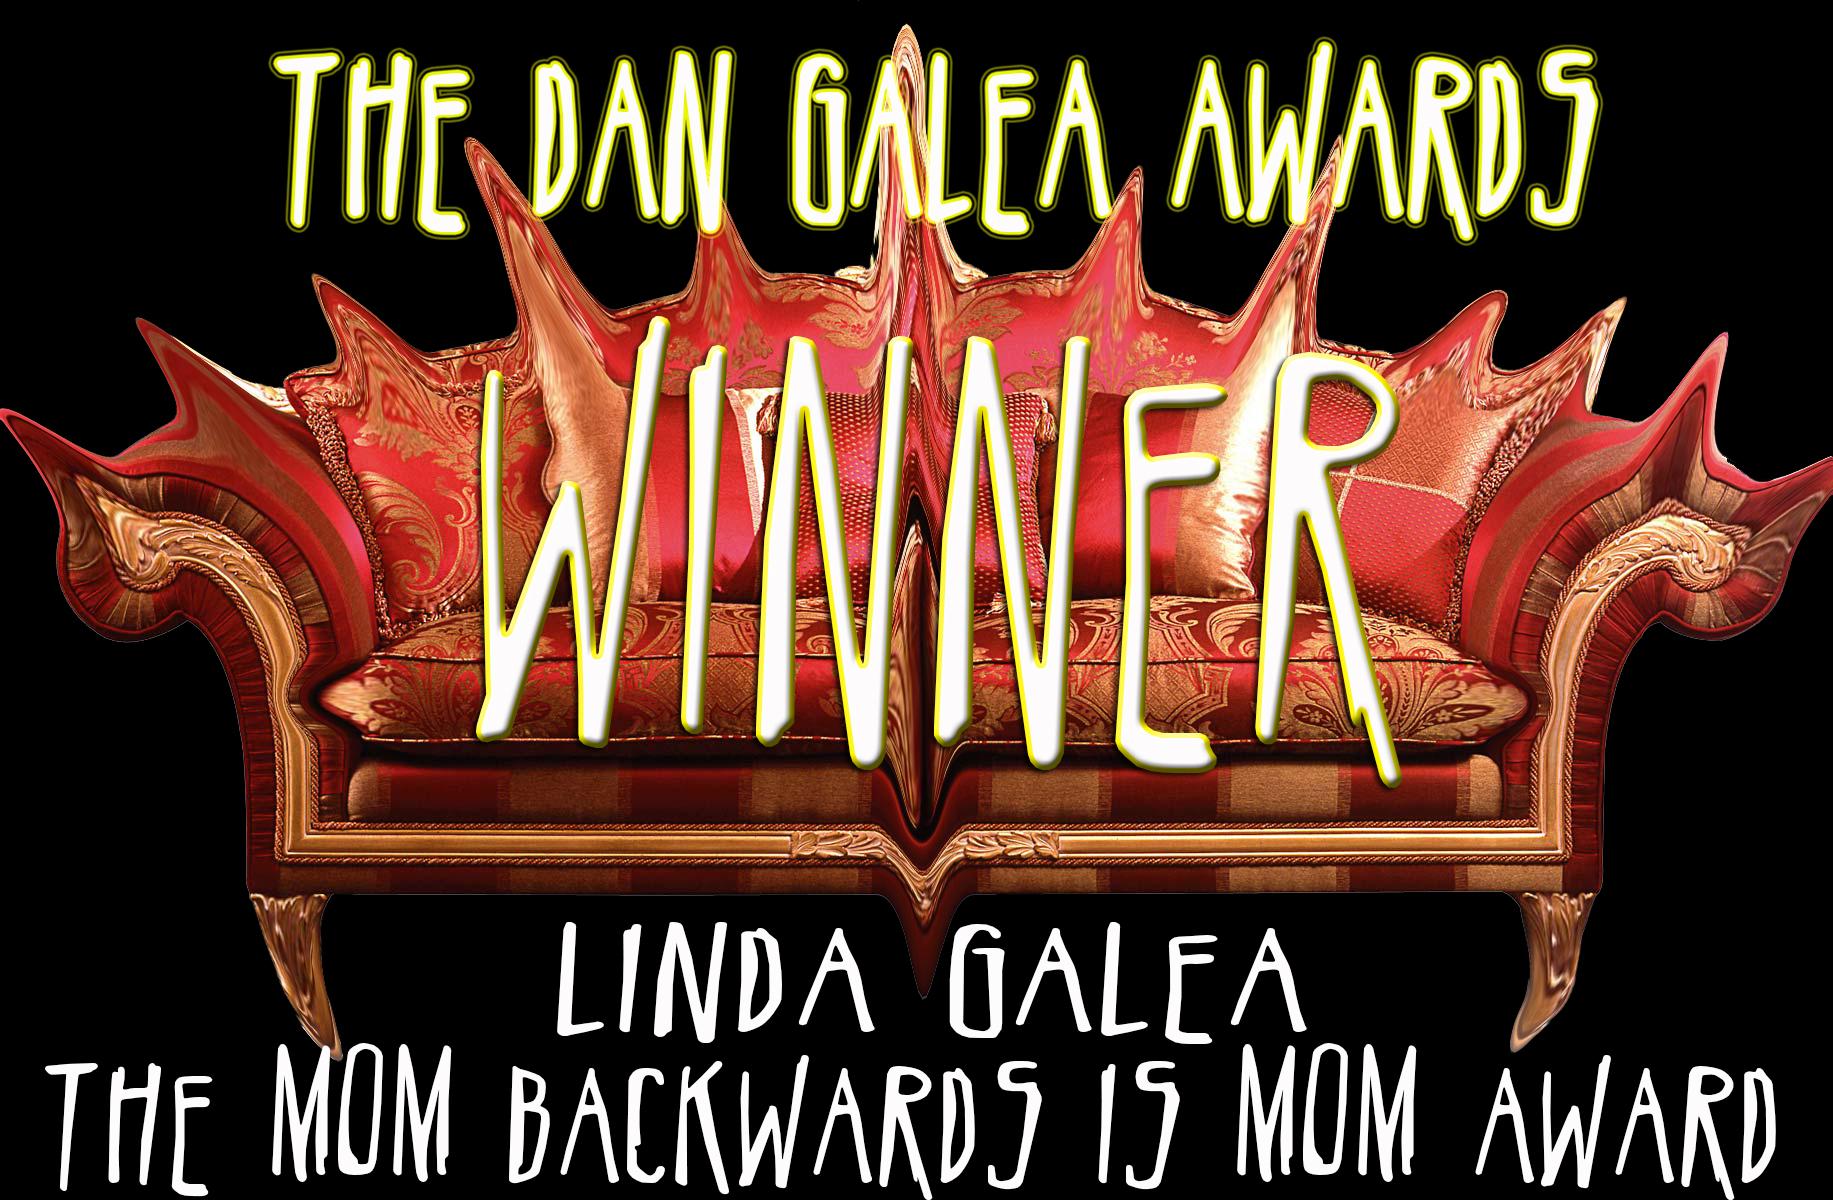 DGAWARDS Linda Galea.jpg